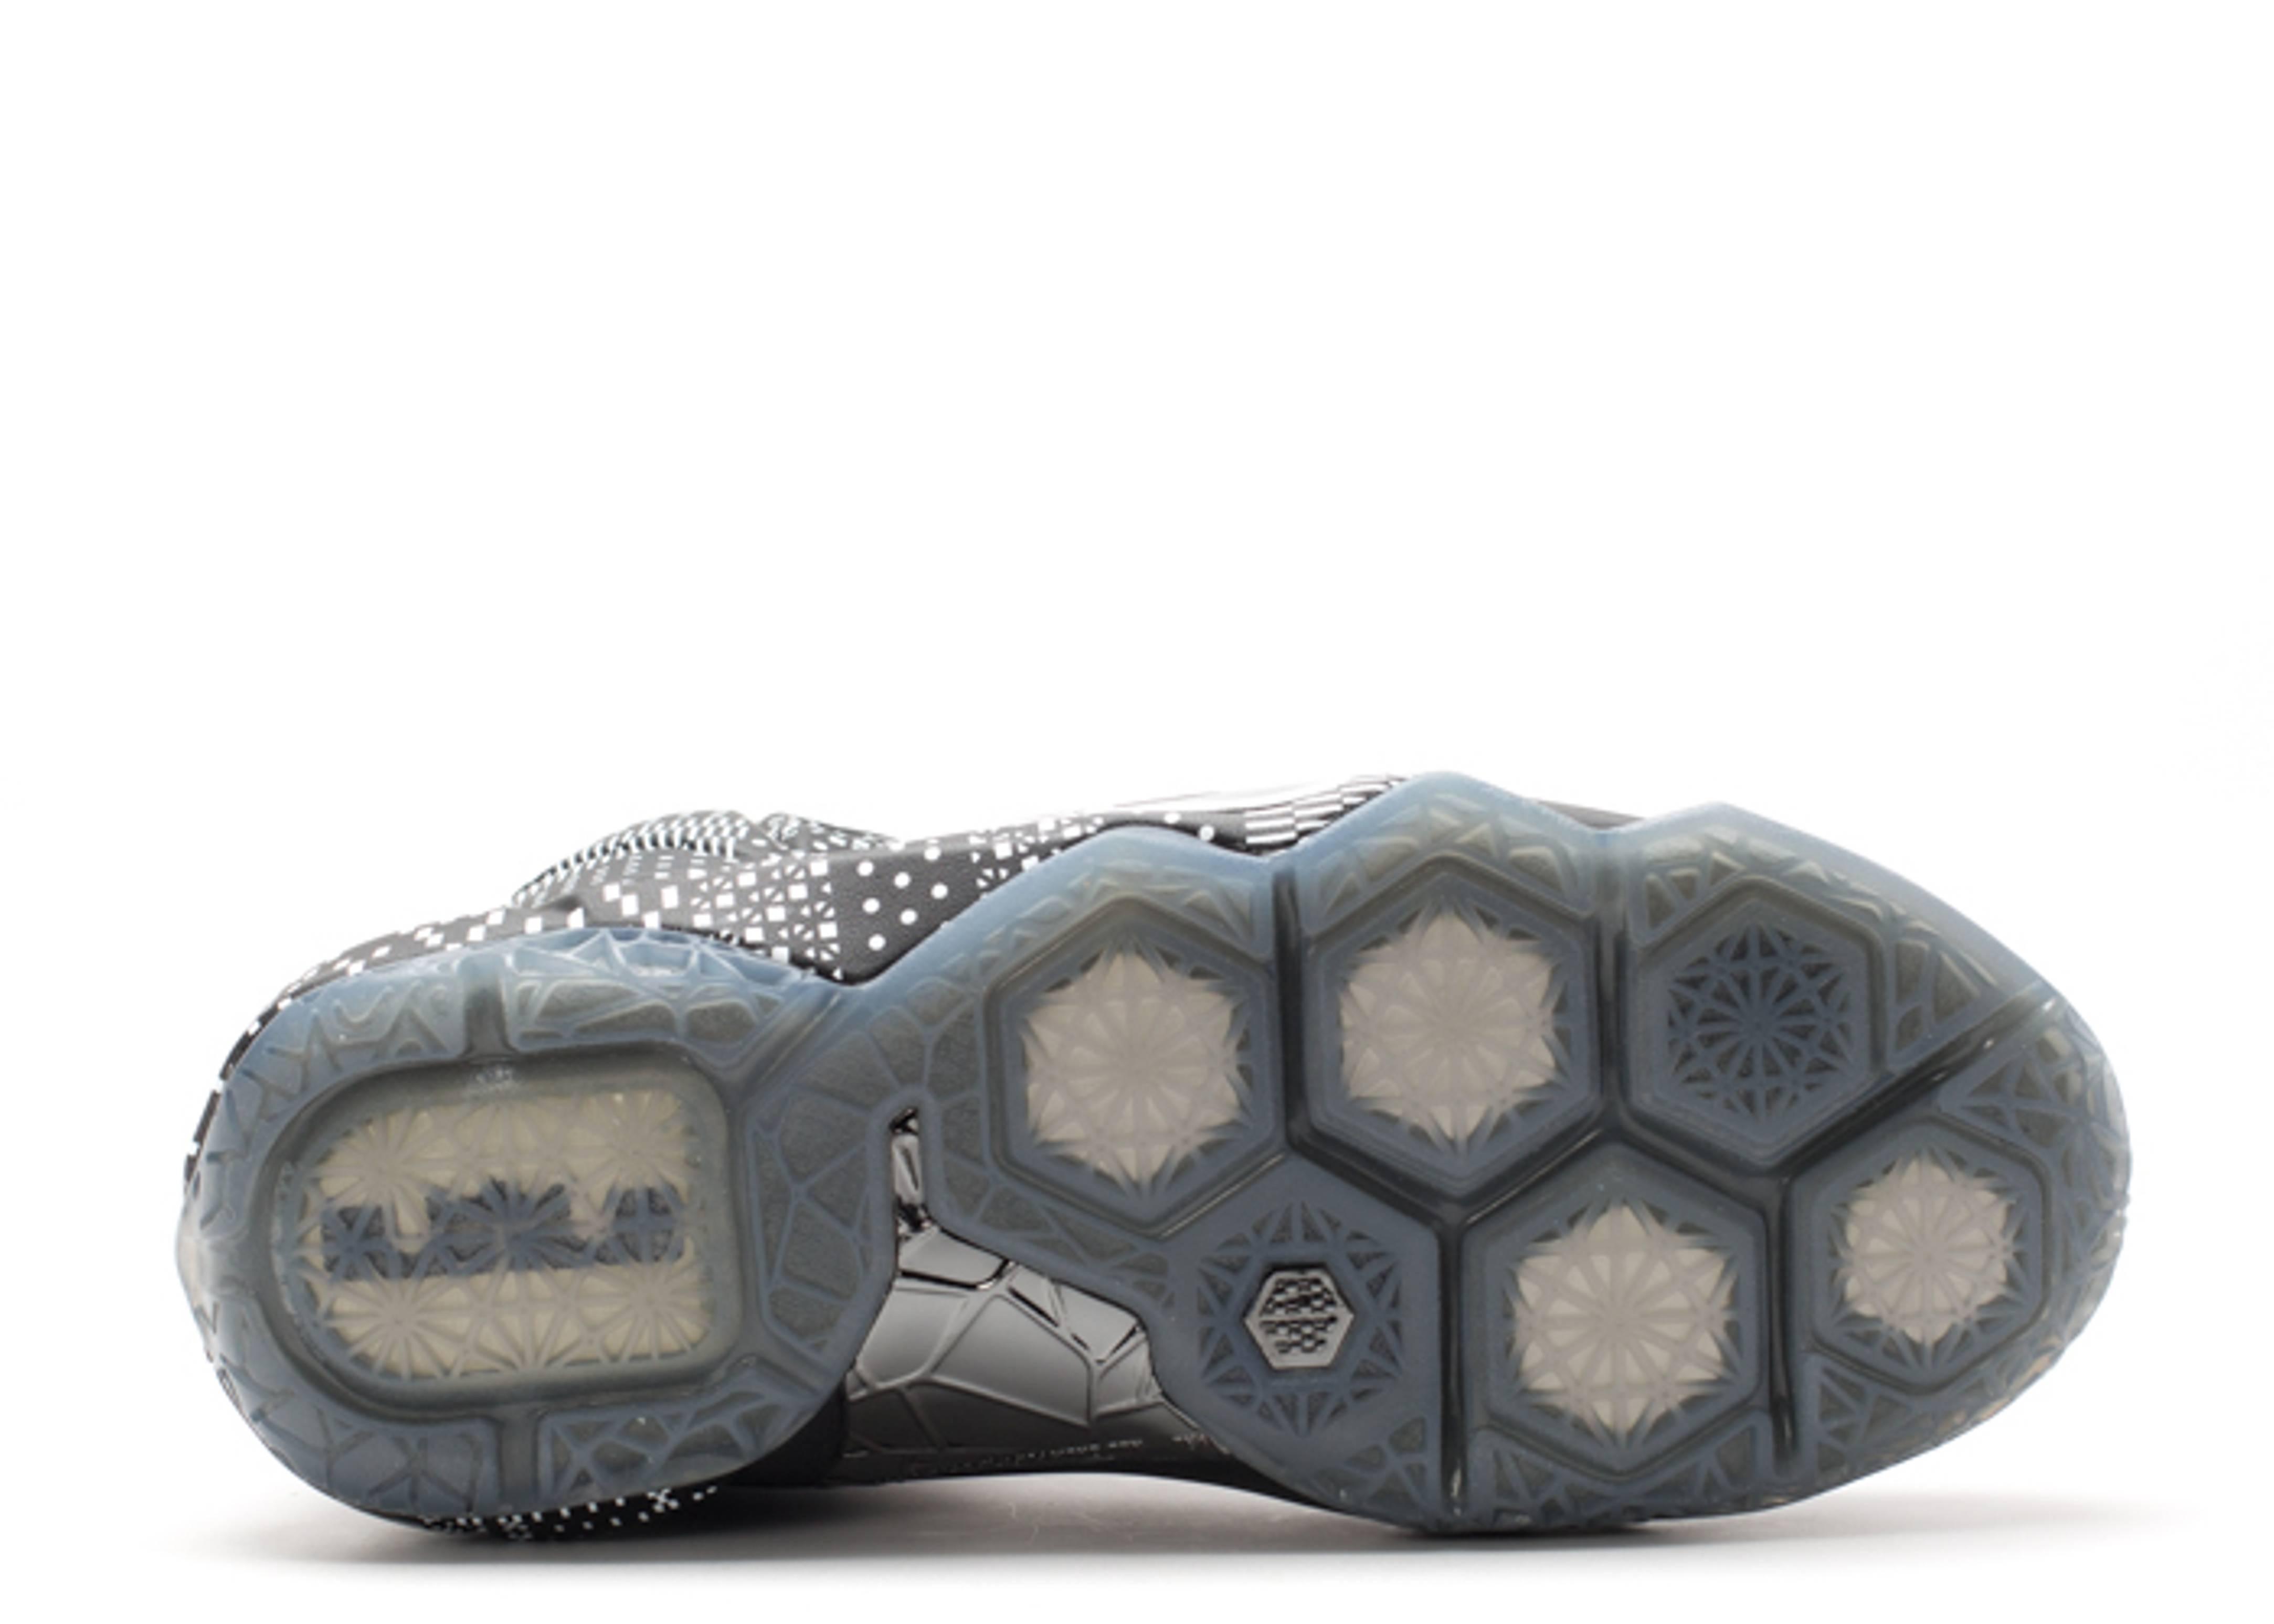 online store 2c361 6776d Lebron 12 Bhm (gs) - Nike - 726217 001 - black/white ...